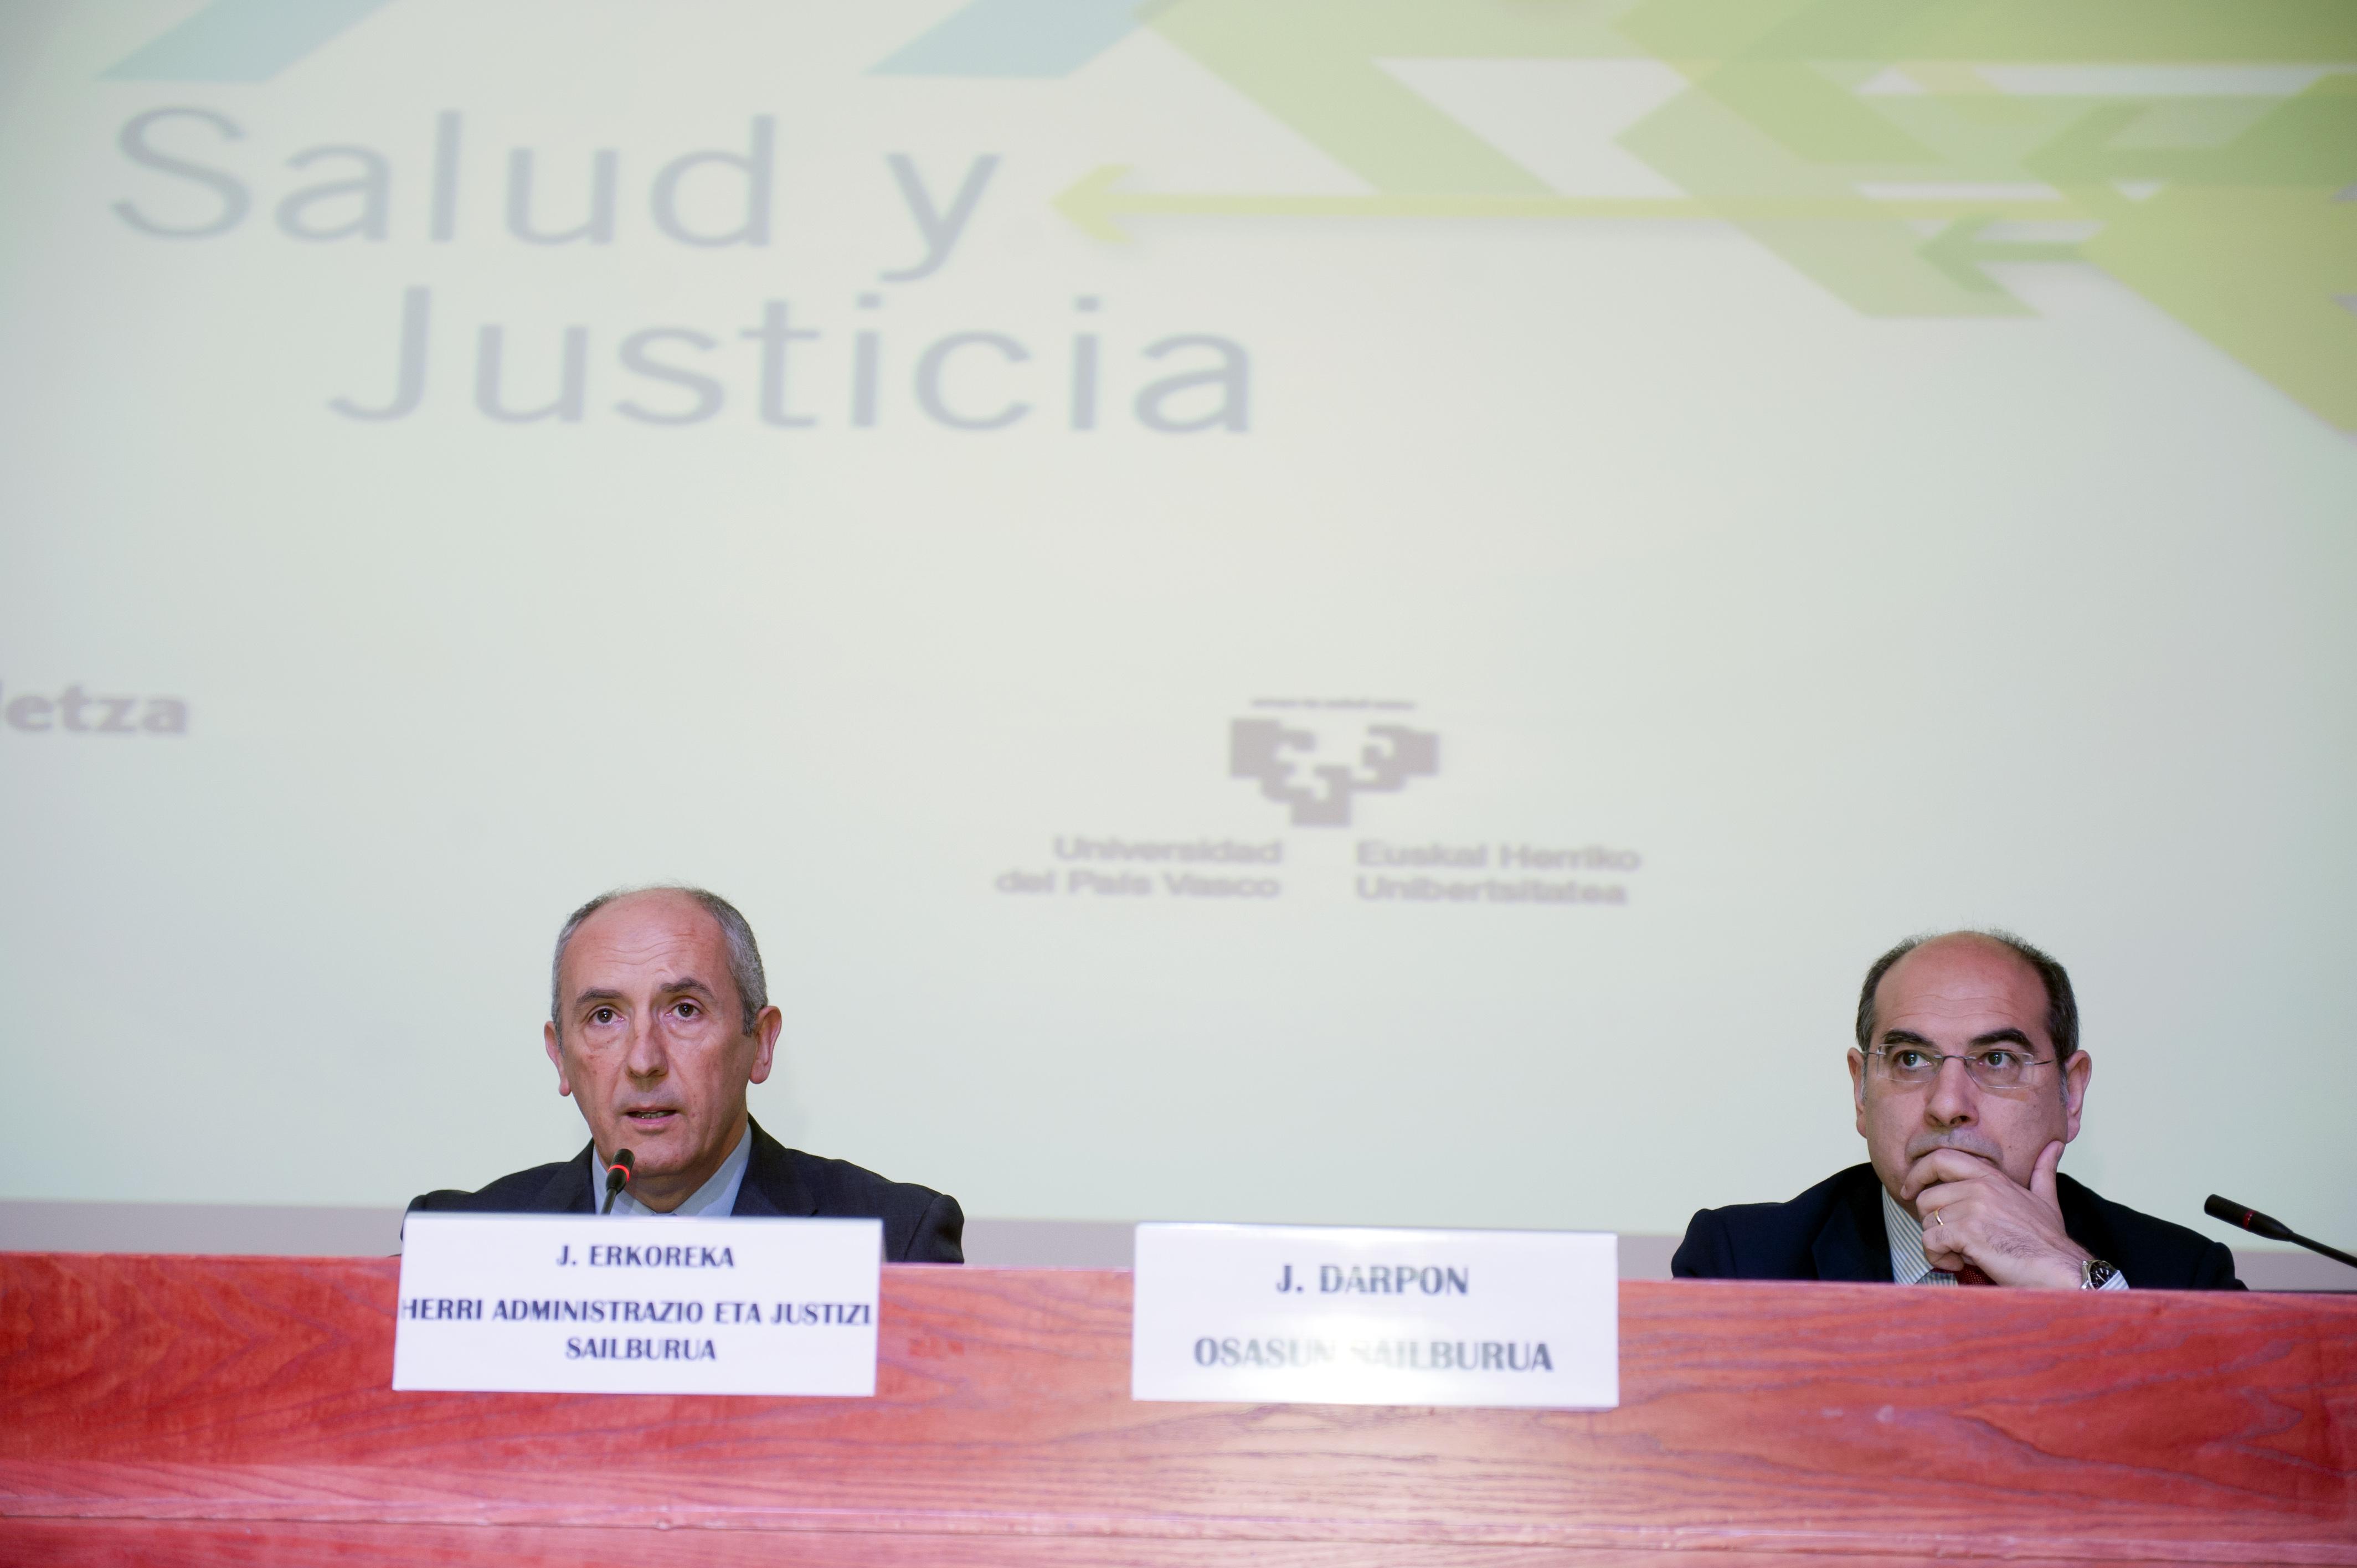 2014_06_16_jornada_salud_justicia_03.jpg